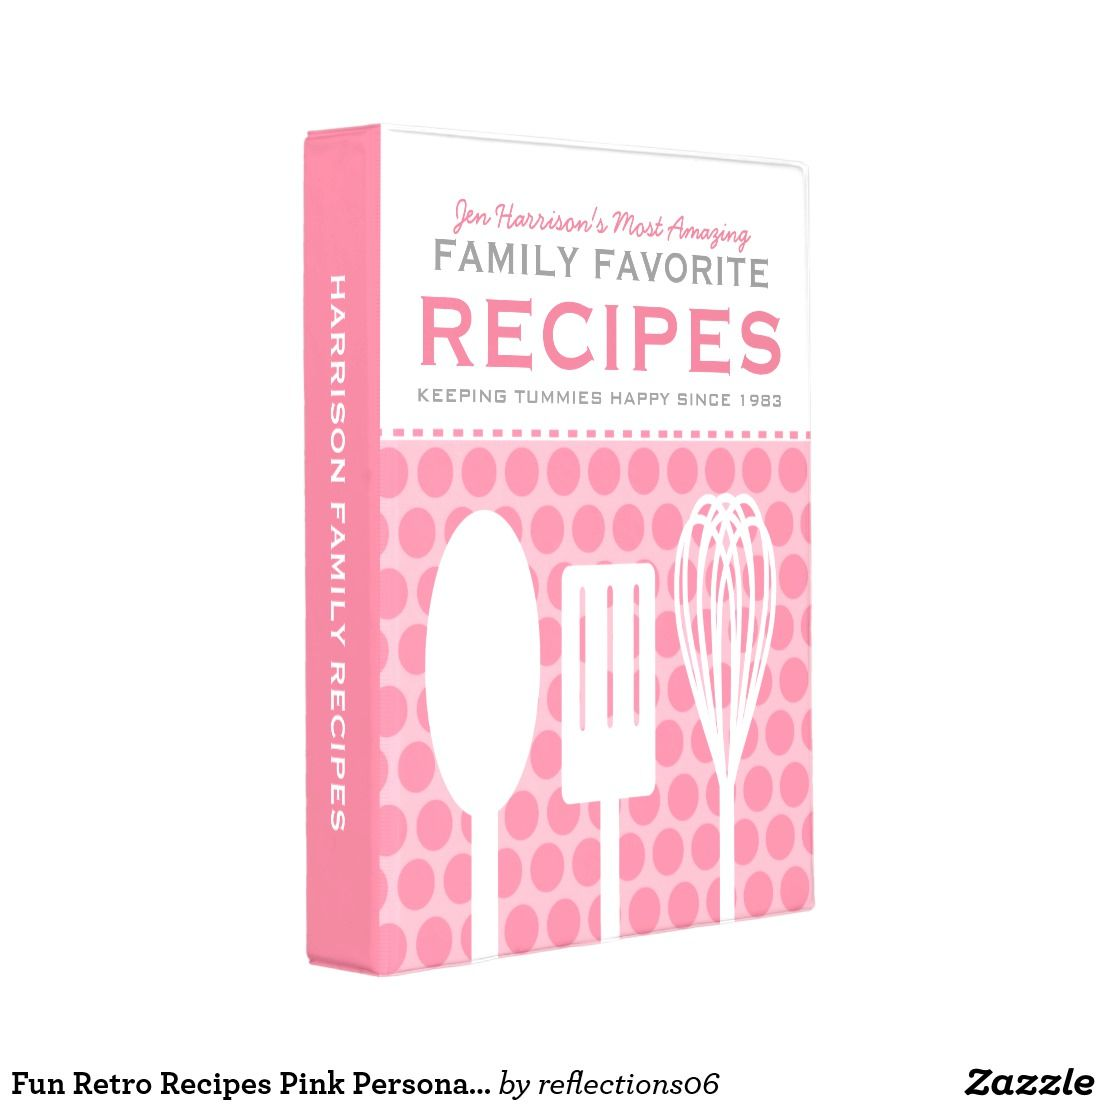 Fun Retro Recipes Pink Personalized Mini Binder